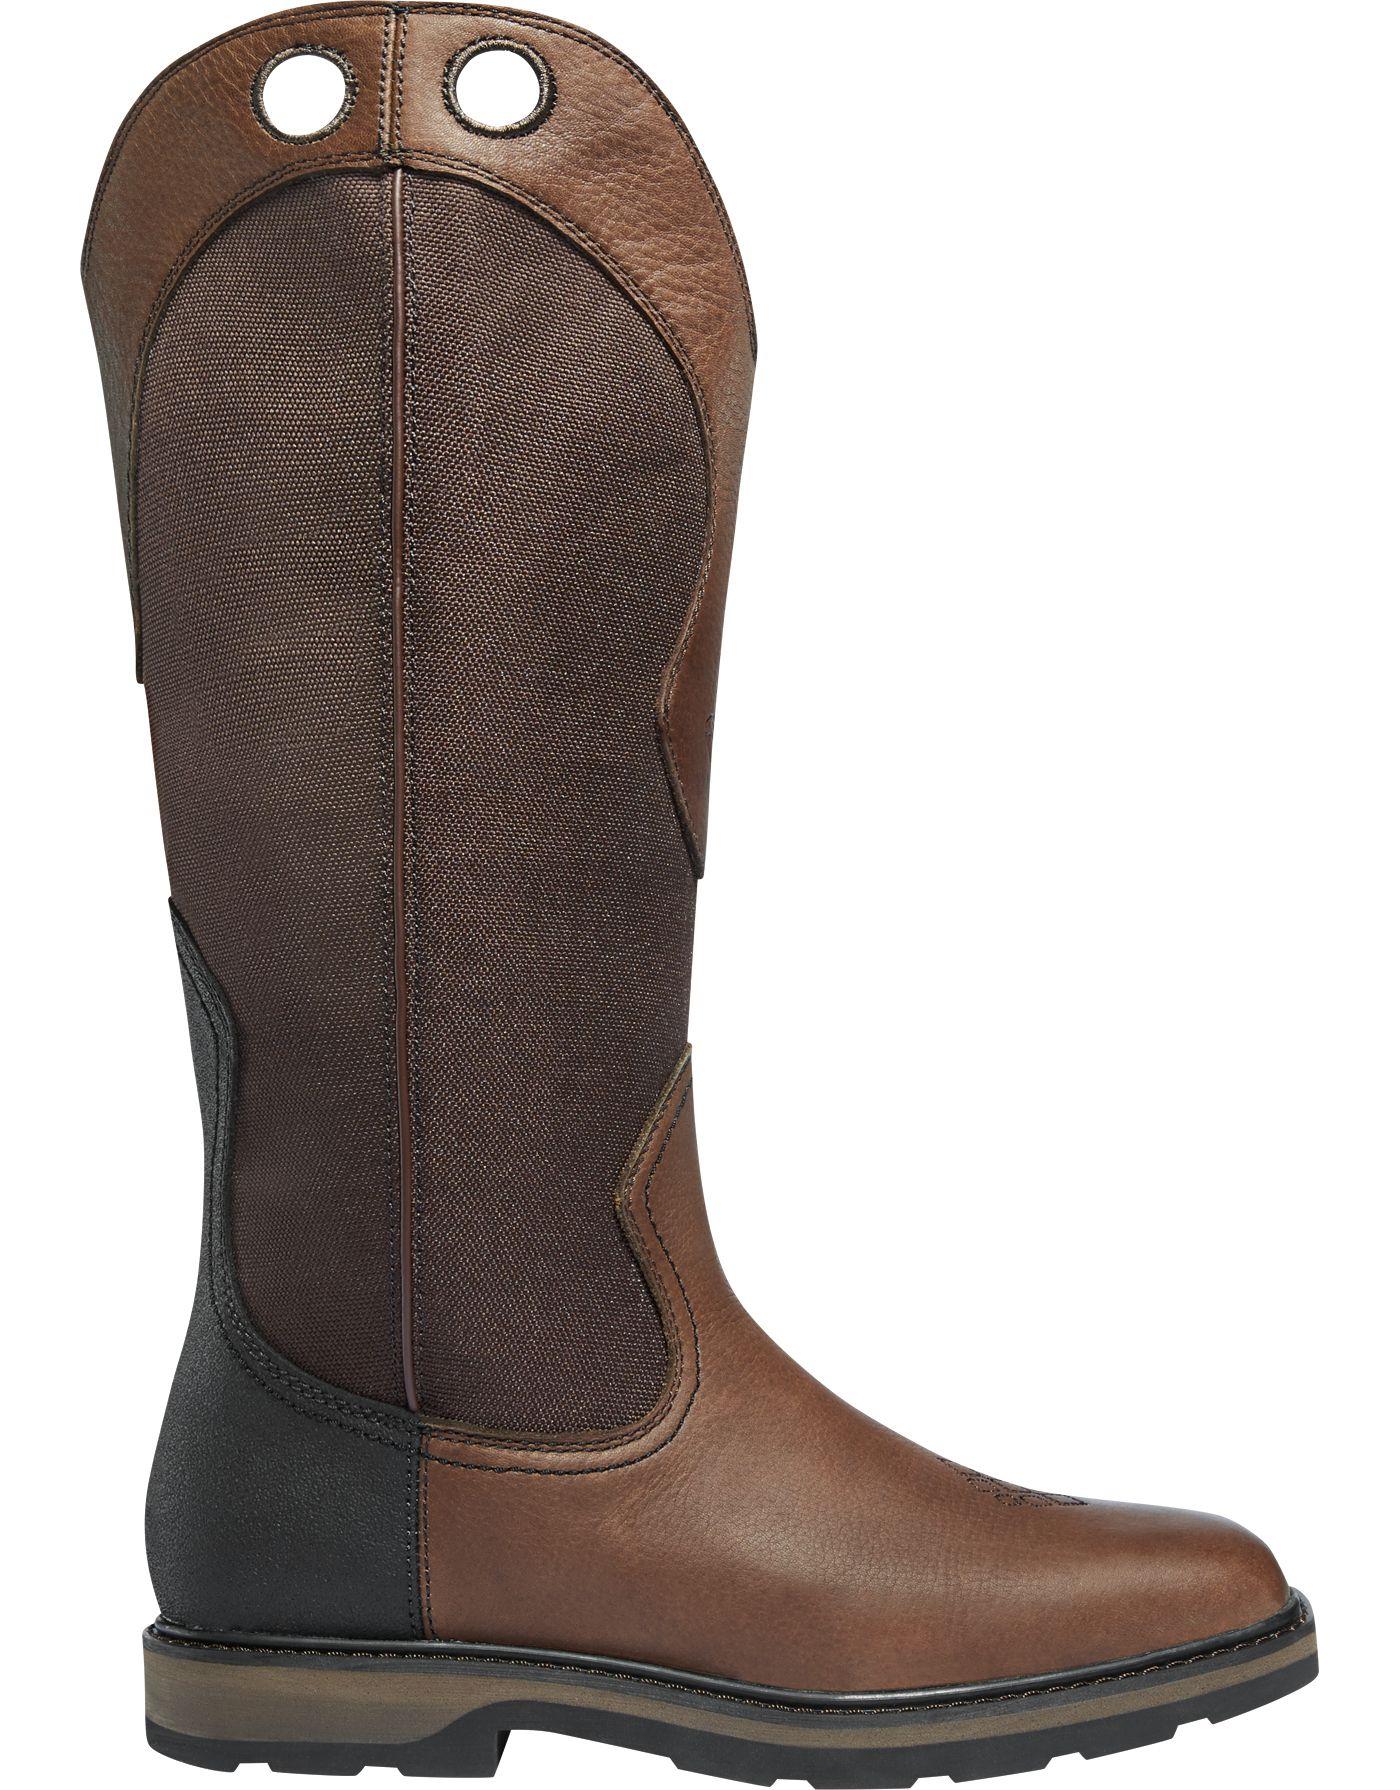 LaCrosse Men's Snake Country Waterproof Snake Boots